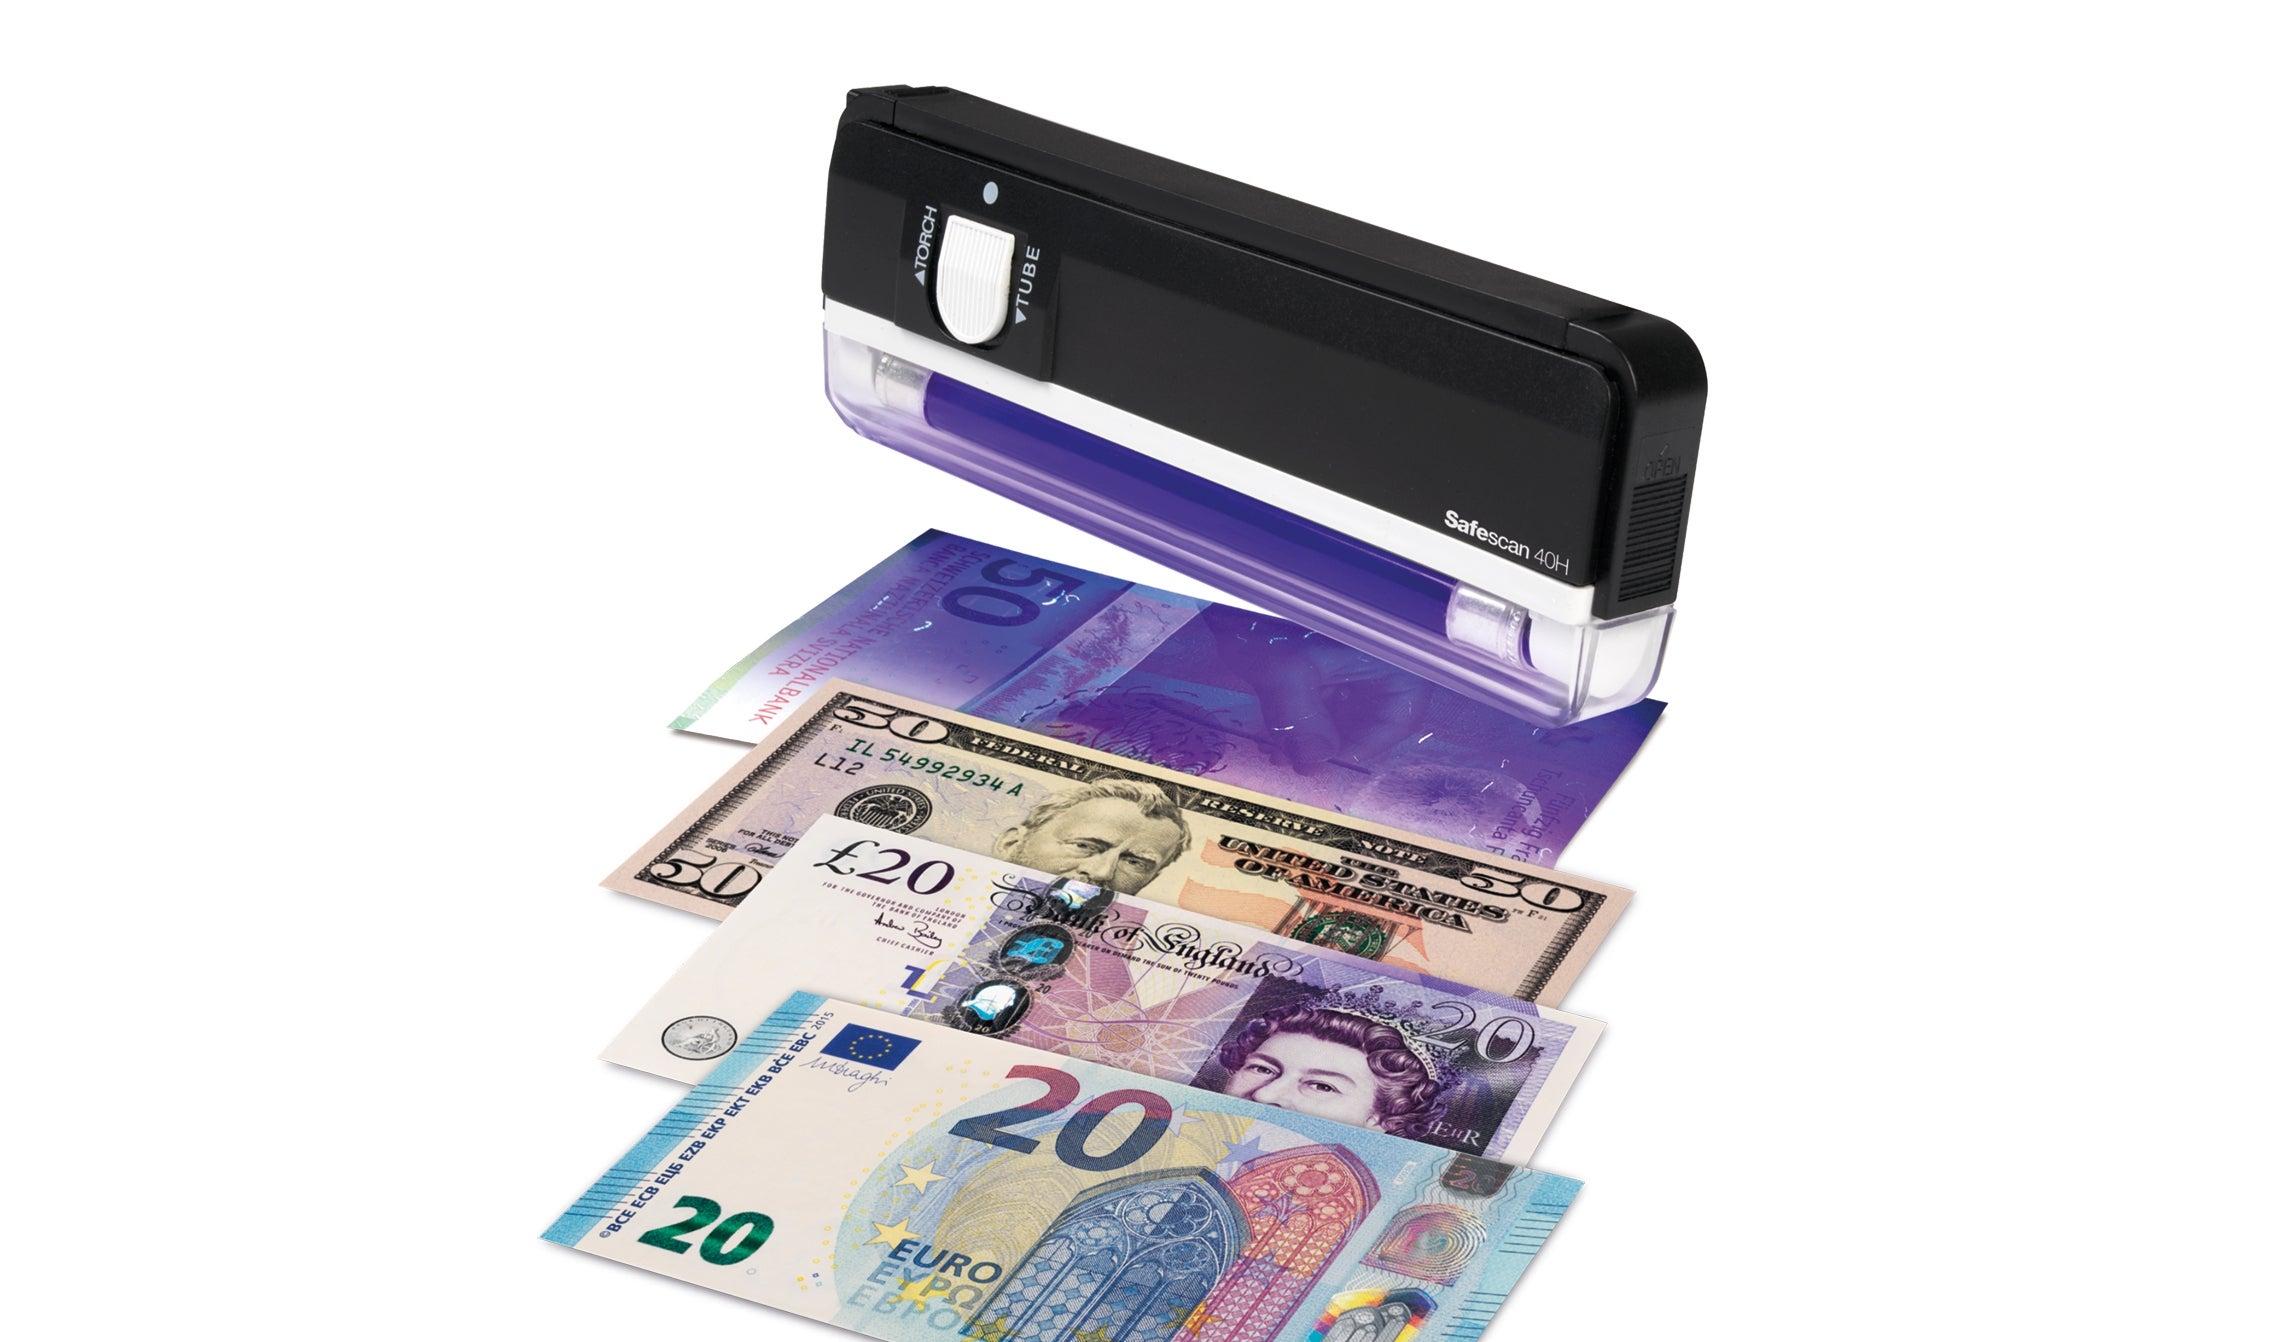 safescan-40h-portable-false-money-detector